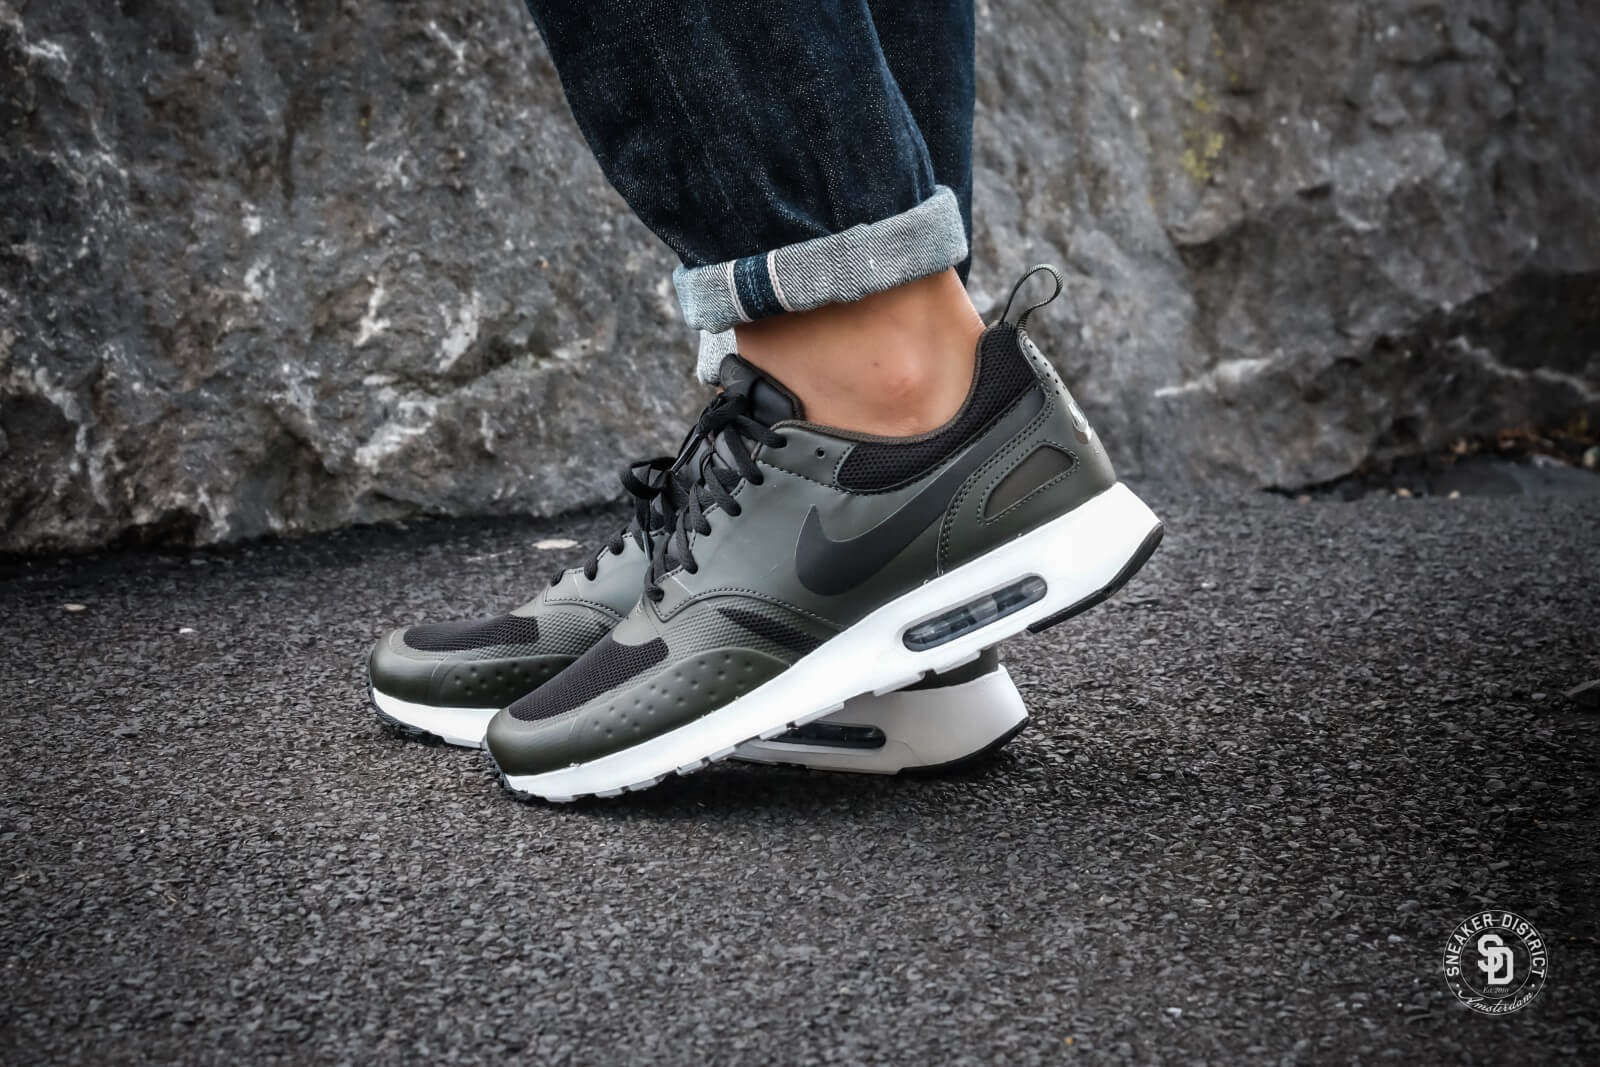 Nike Air Max Vision BlackSequoia heren sneakers | Geen verzendkosten | Sneaker District